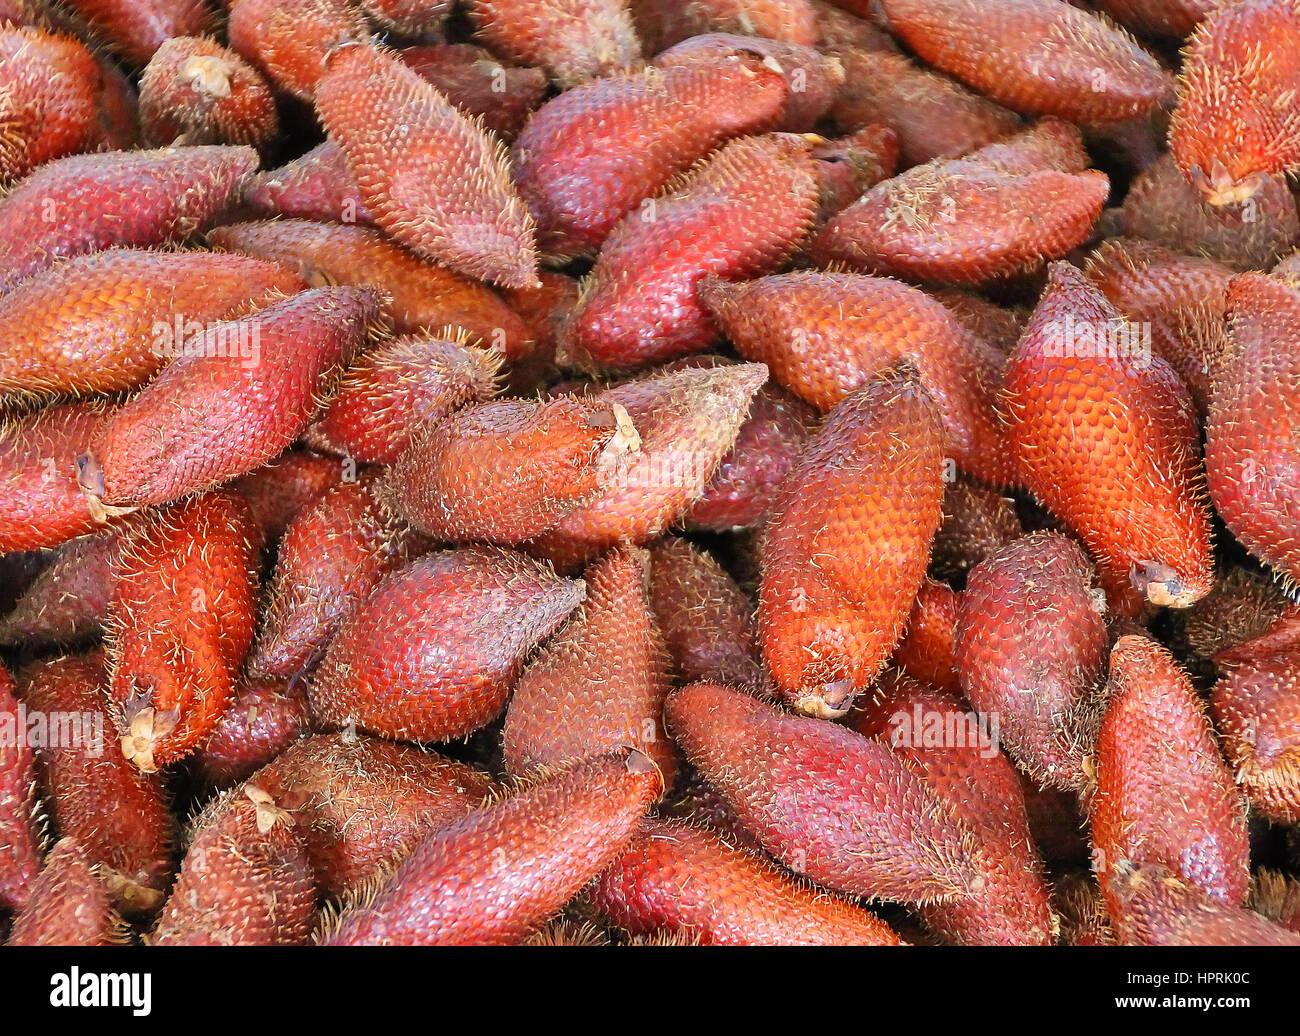 Salak fruit or Snake Fruit in Thai Local Market - Stock Image